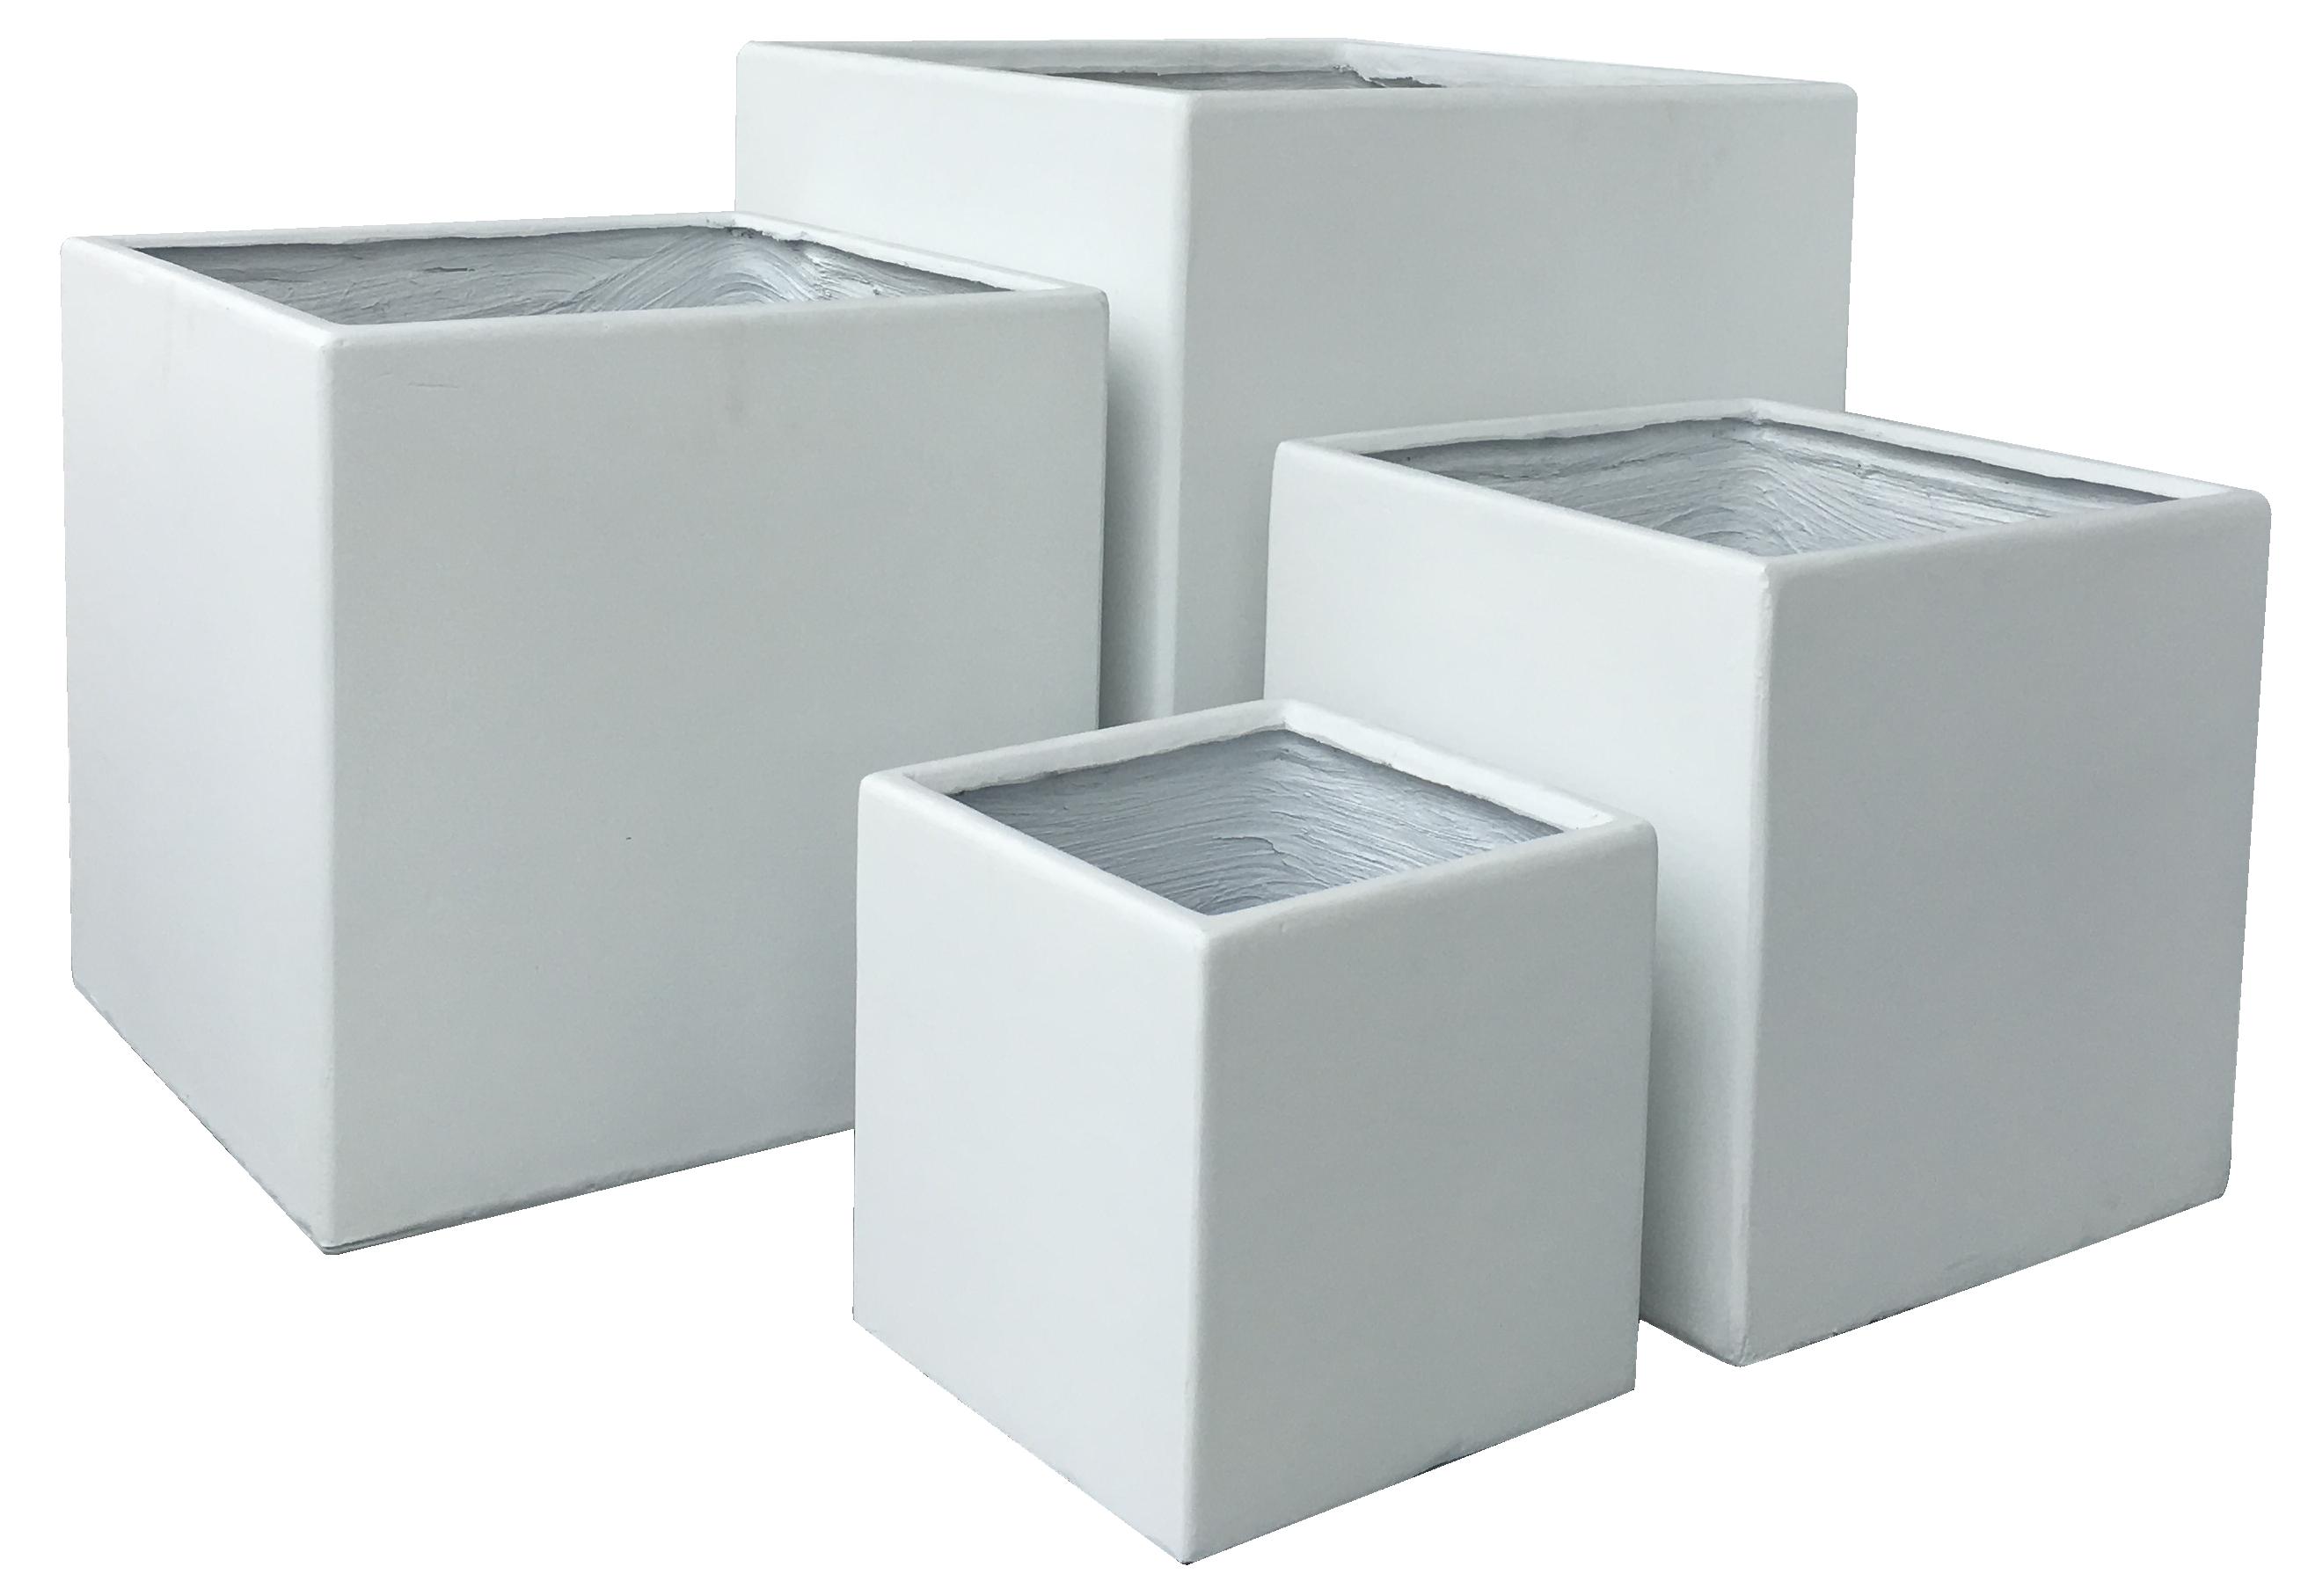 Extrem Exklusiv & hochwertig - Premium Pflanzkübel Set - Lounge Cube Pot PK12